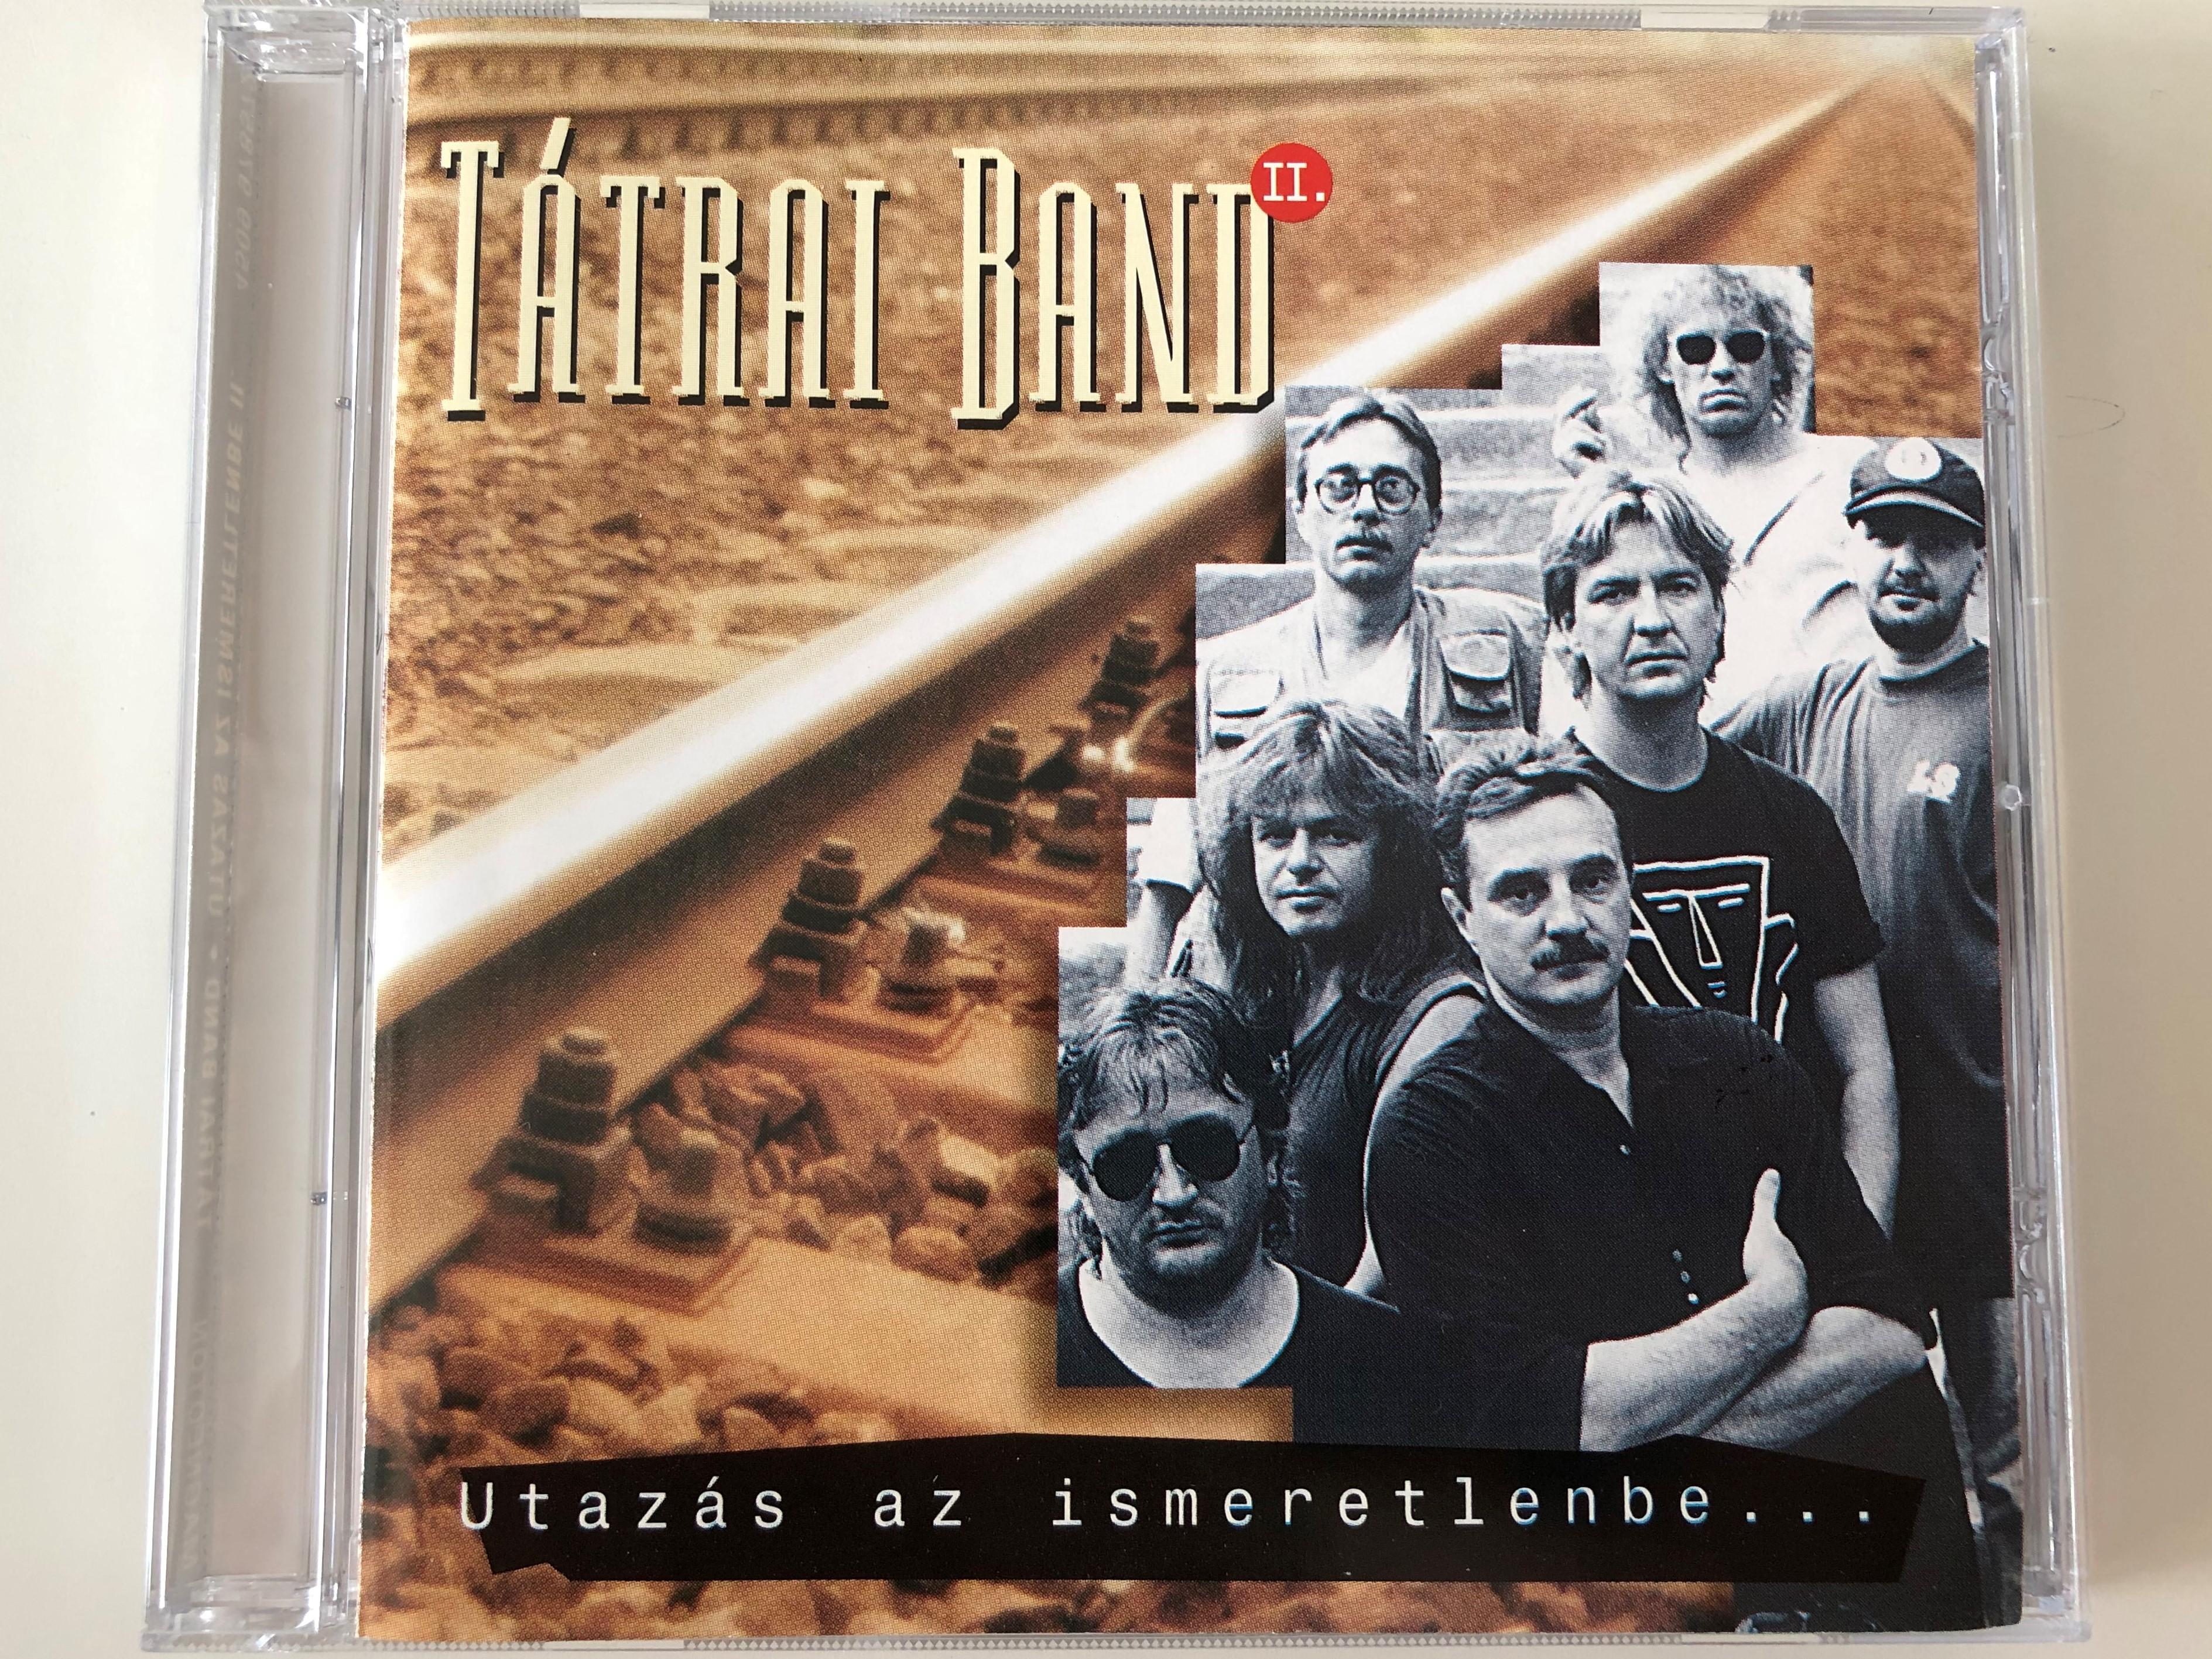 t-trai-band-utaz-s-az-ismeretlenbe...-ii.-magneoton-audio-cd-1994-4509-978572-1-.jpg